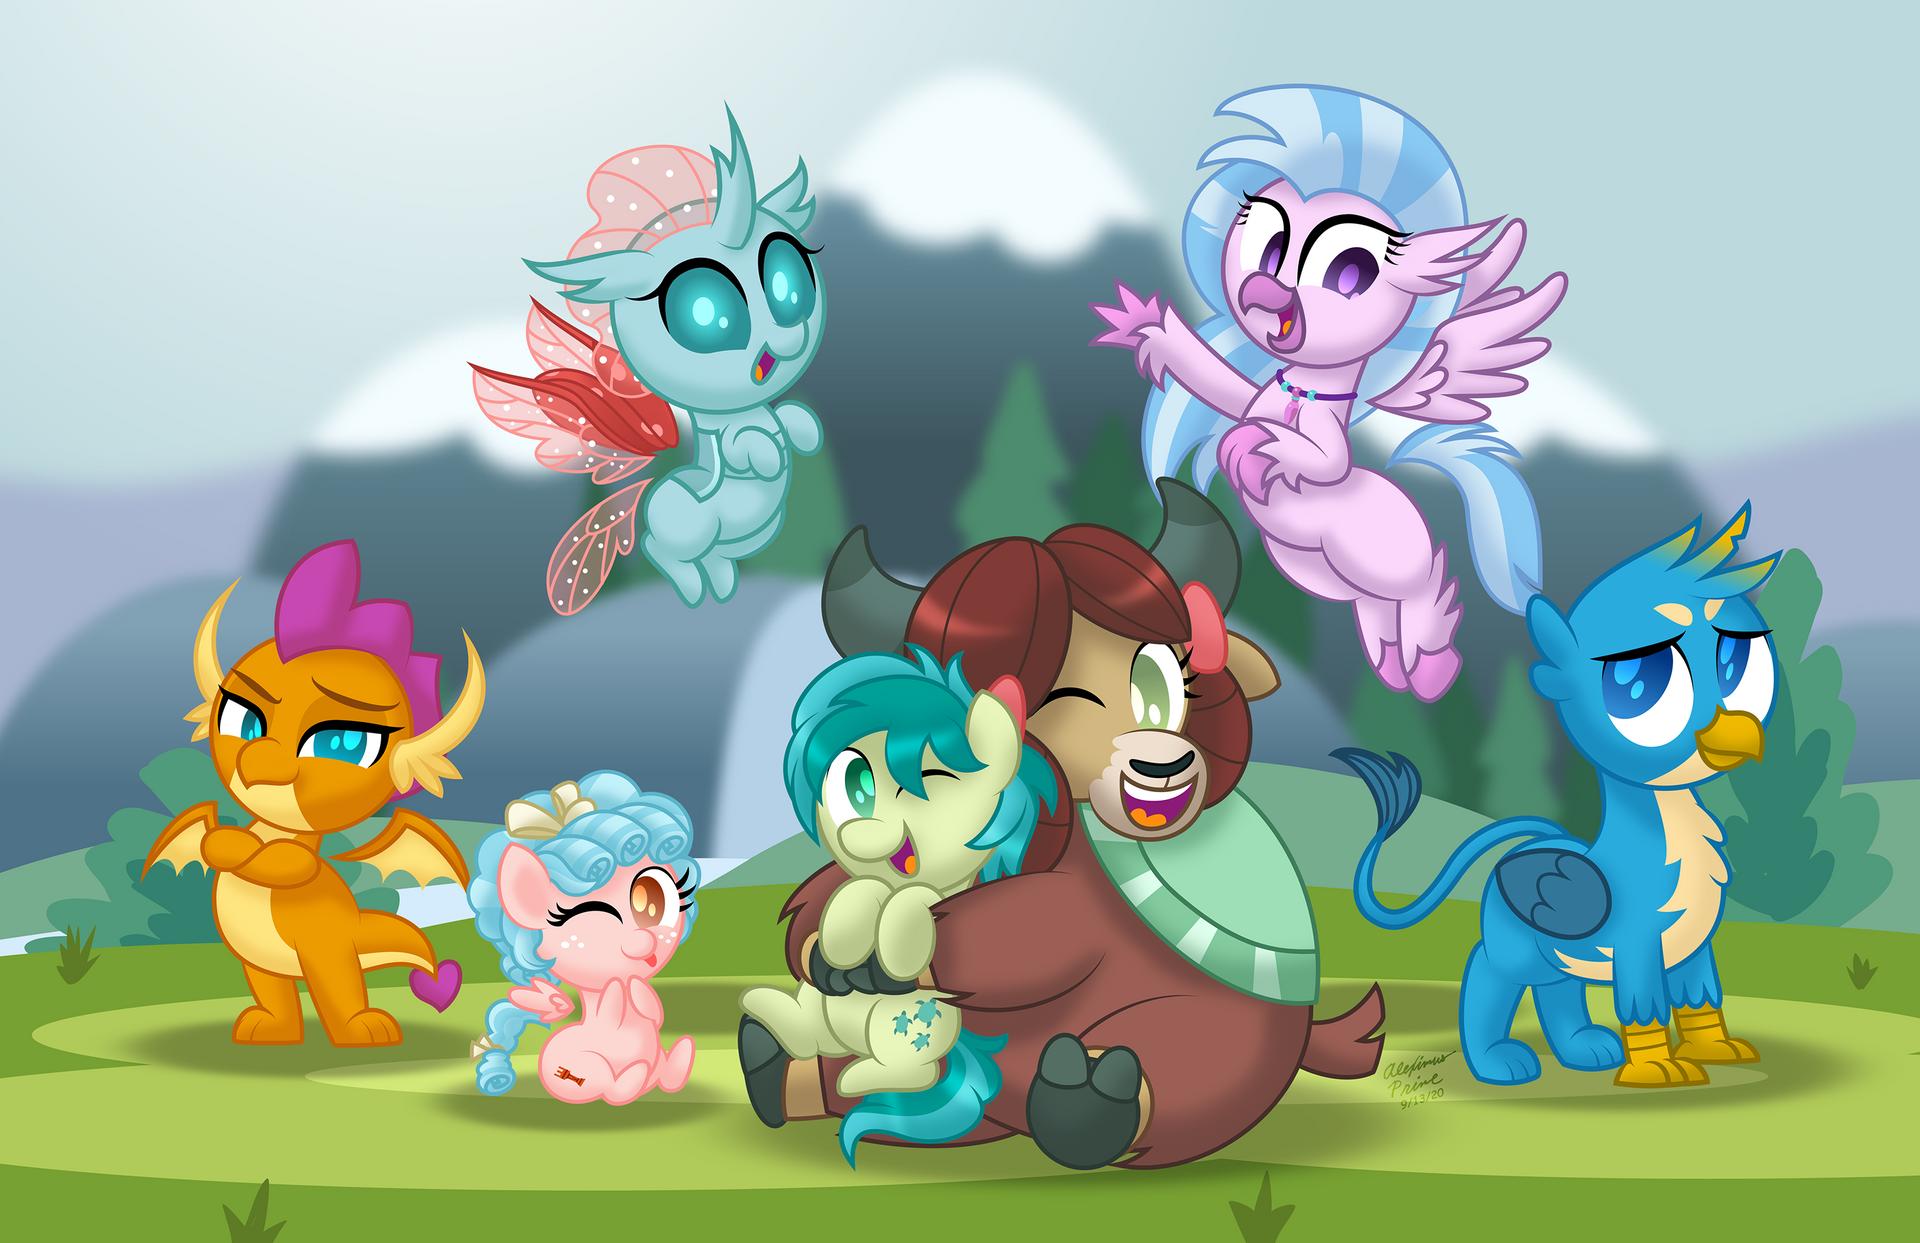 Chibi Ponies: Students